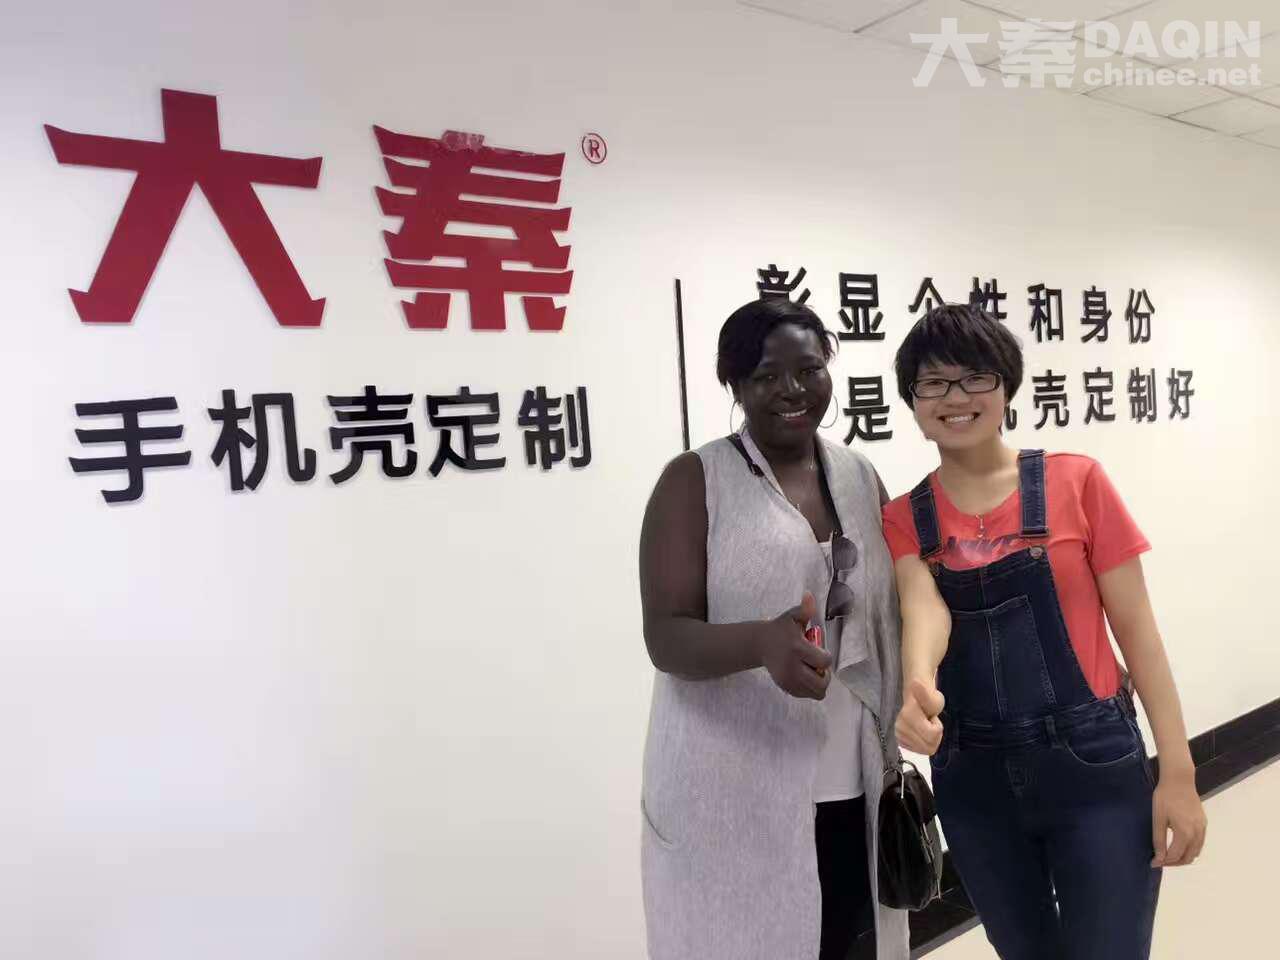 African customer visit DAQIN